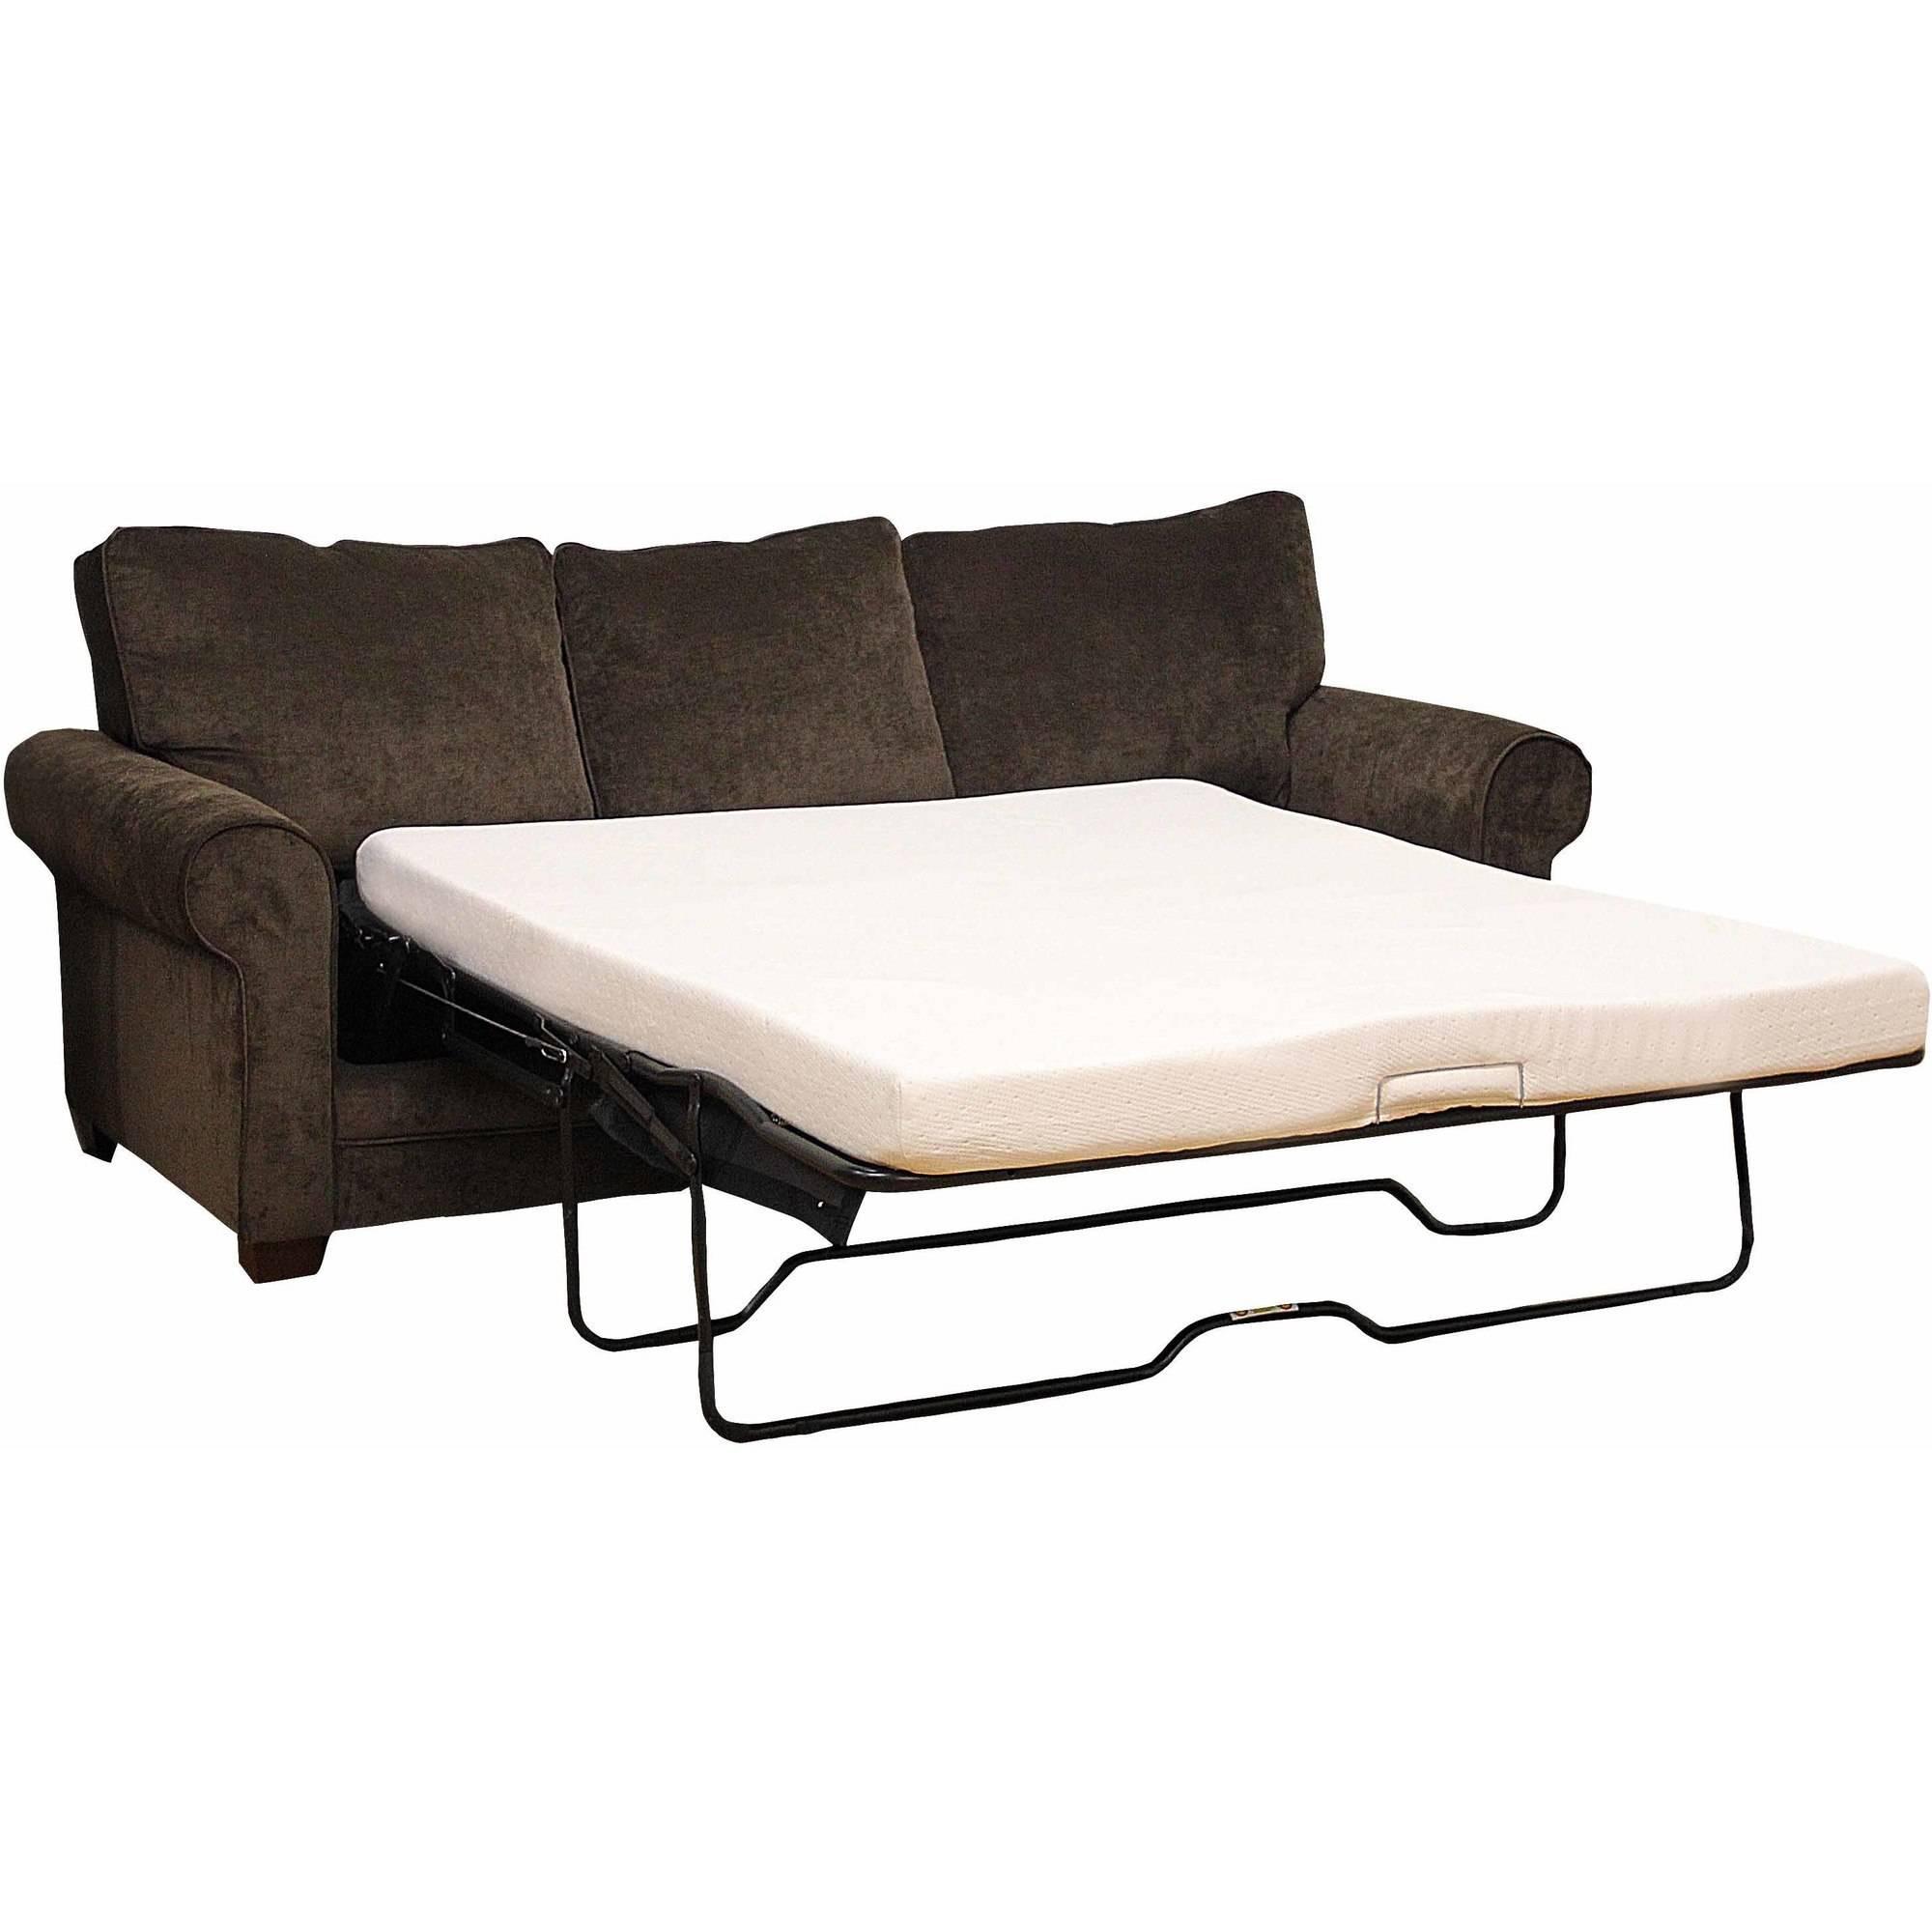 sofa bed mattress modern sleep memory foam 4.5 QJICDQQ